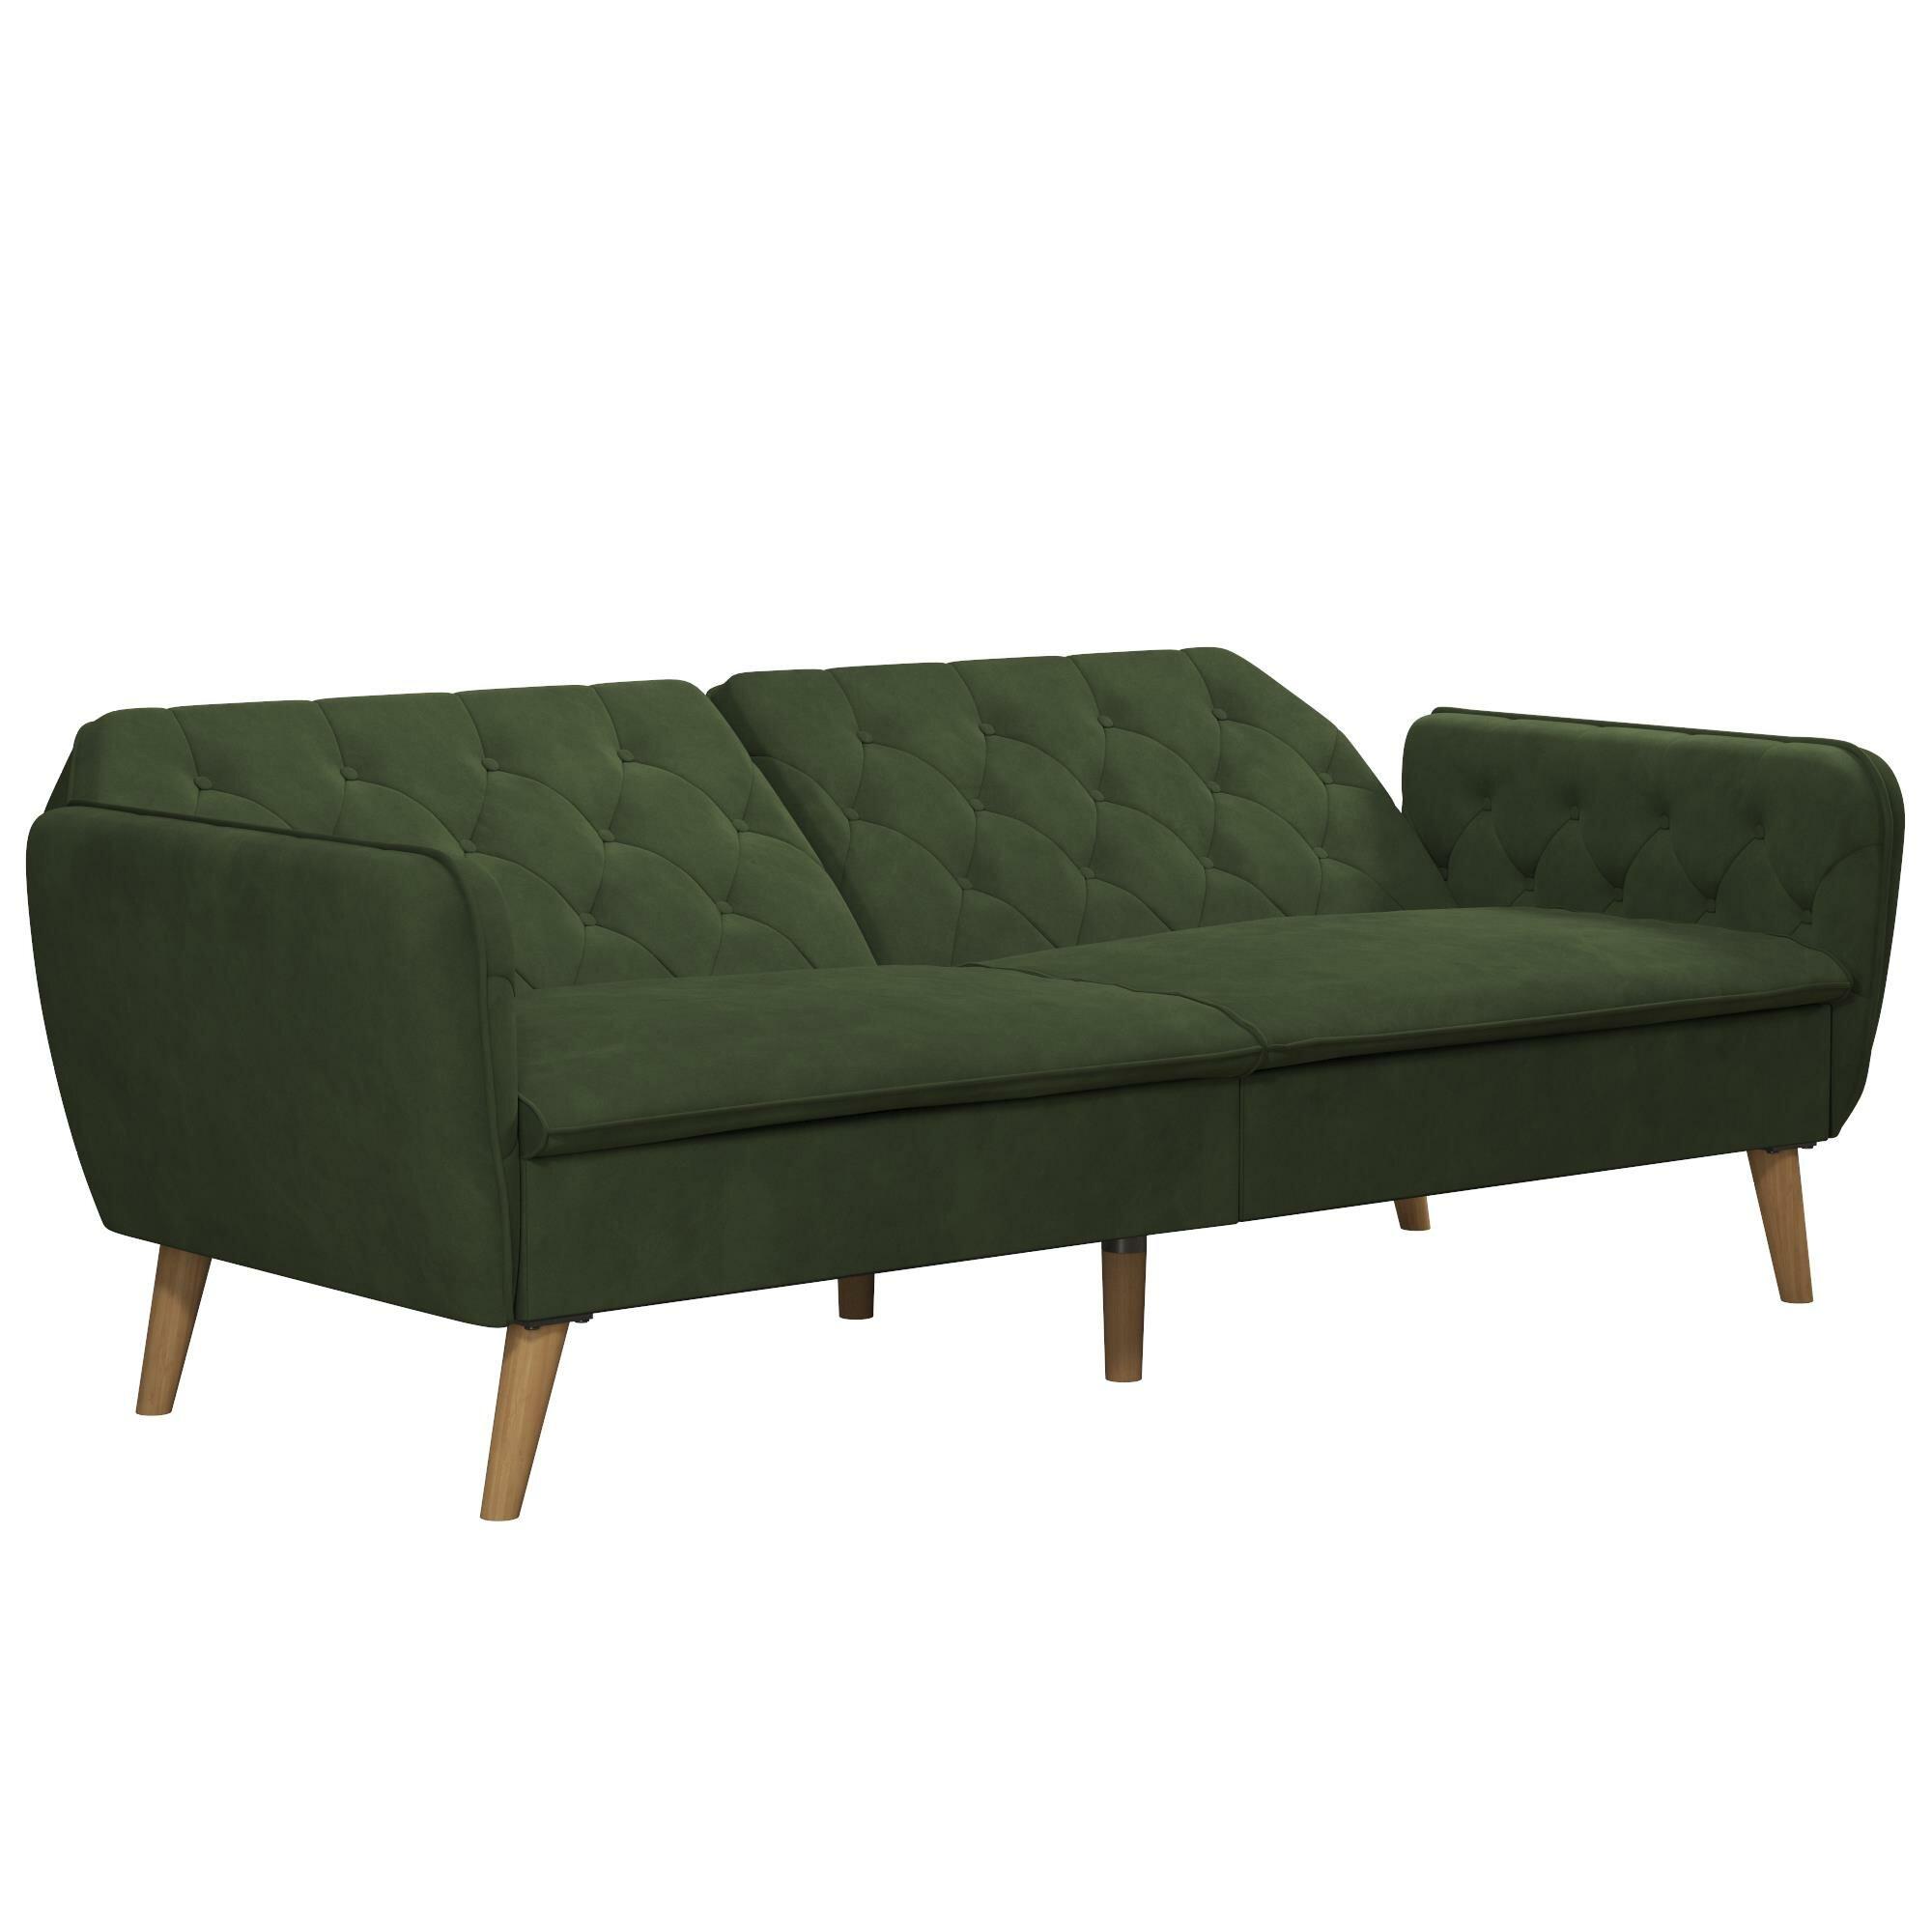 Magnificent Tallulah Futon Lamtechconsult Wood Chair Design Ideas Lamtechconsultcom